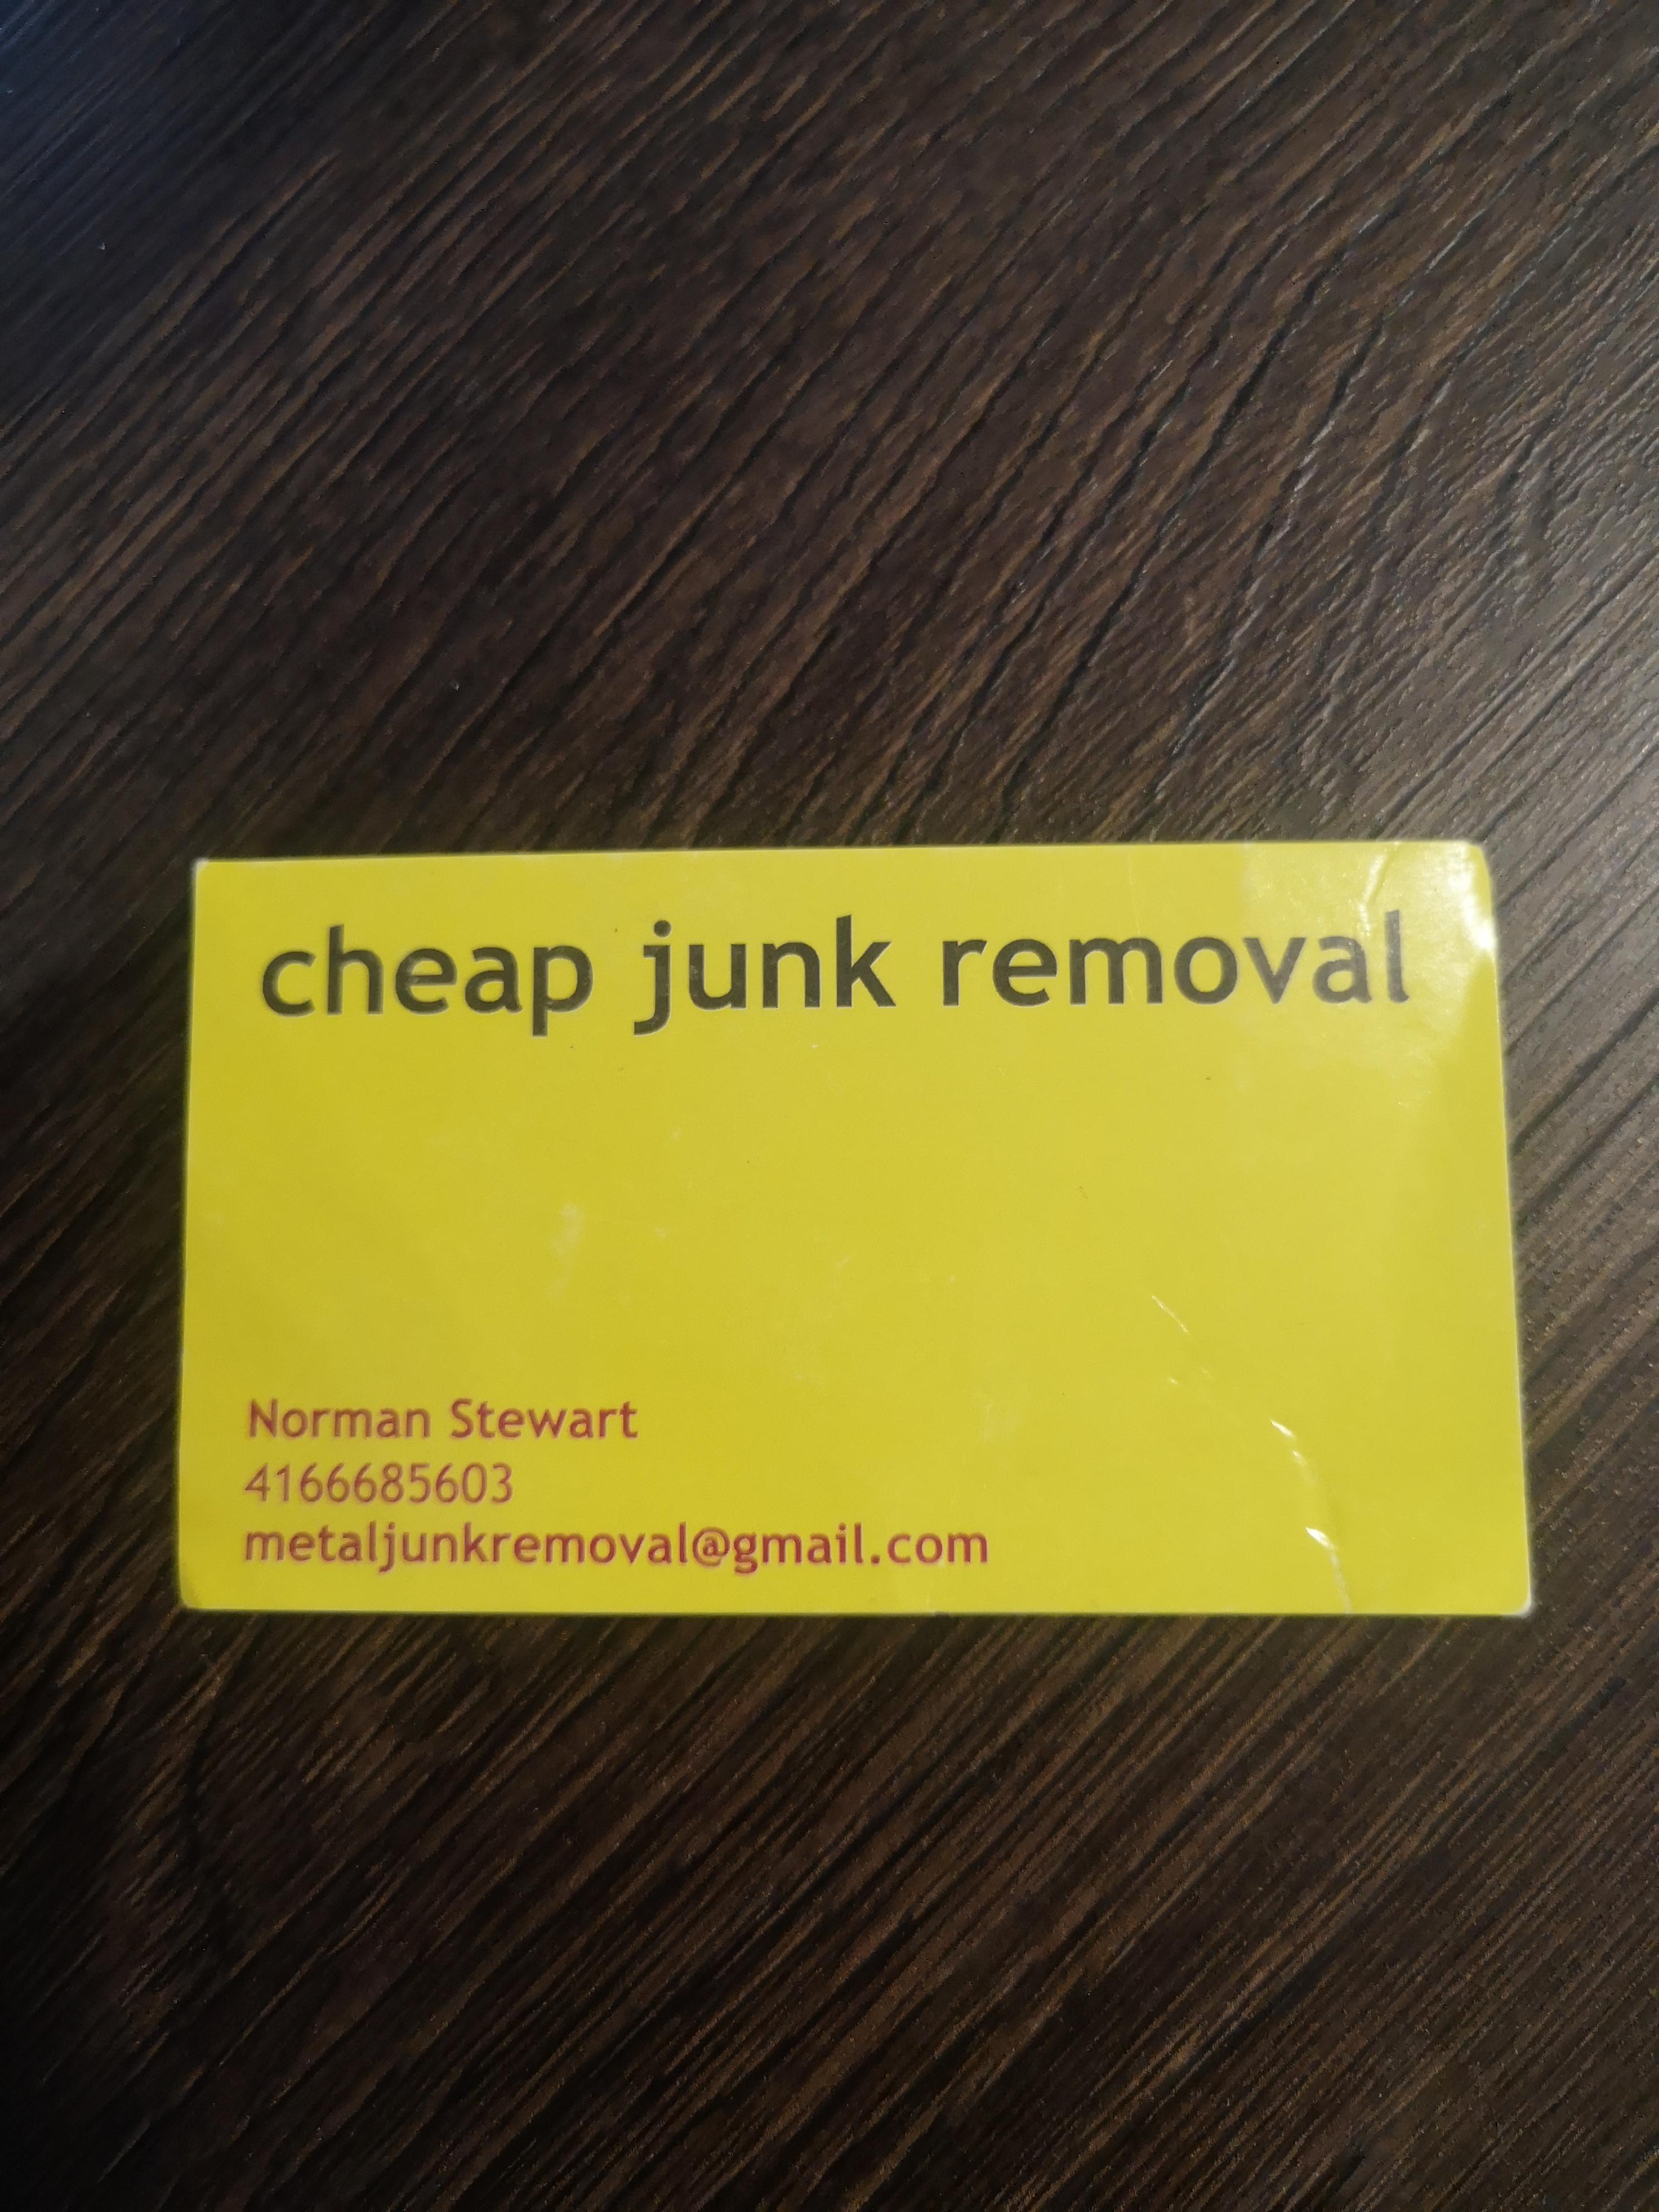 Cheap junk removal